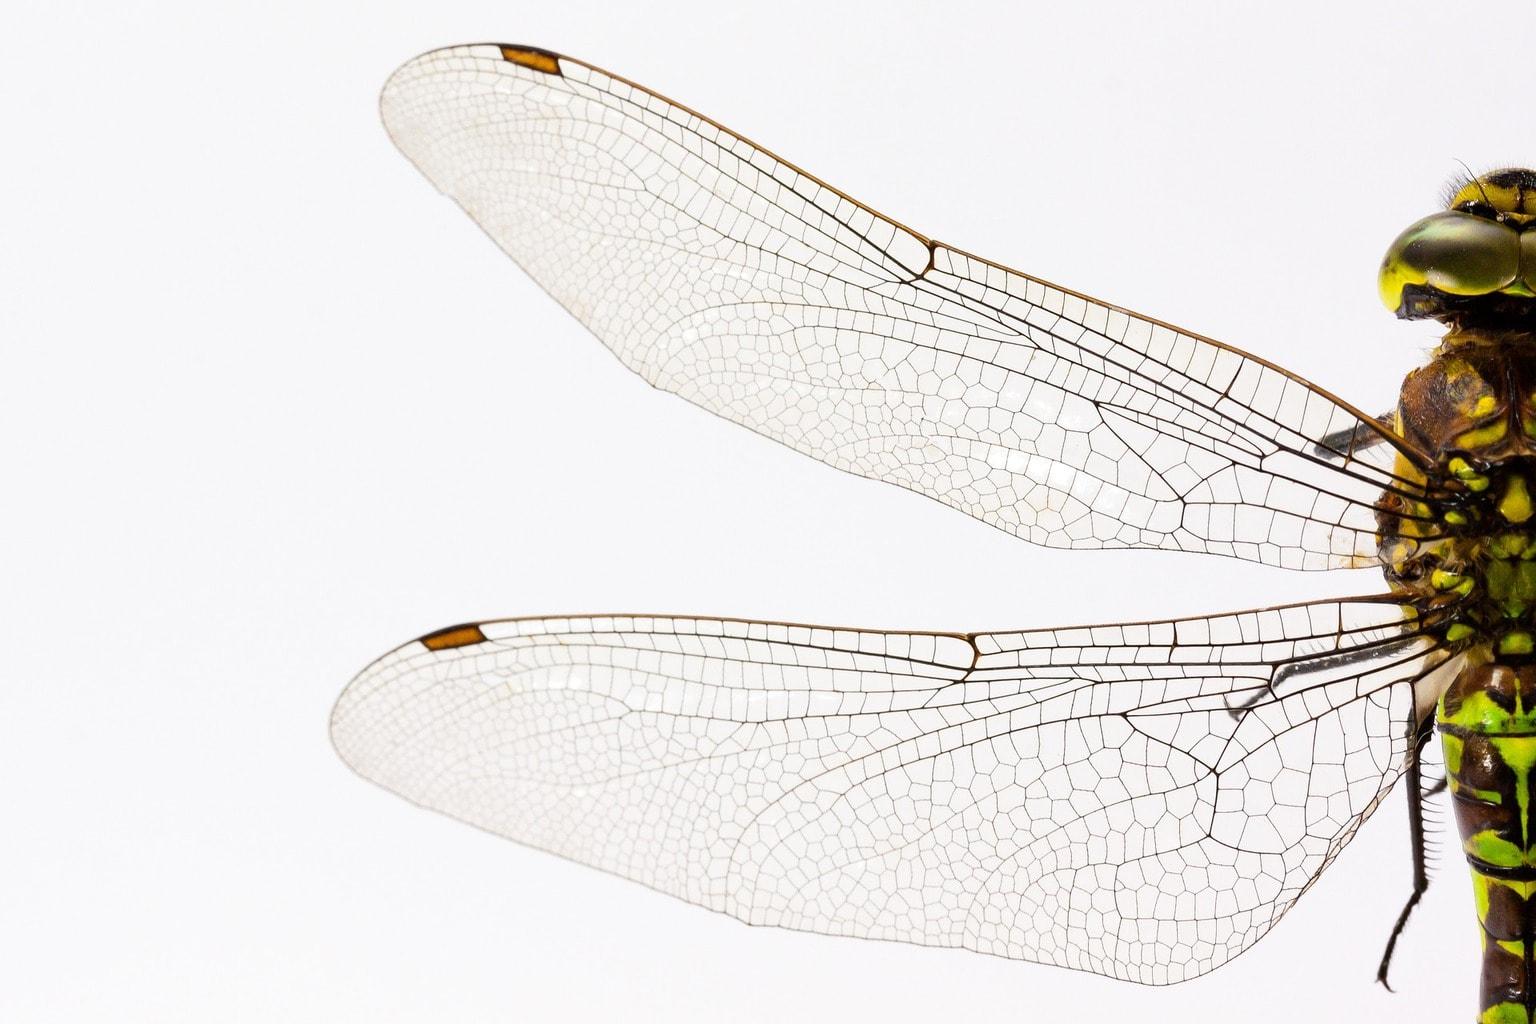 dragonfly-867888_1920